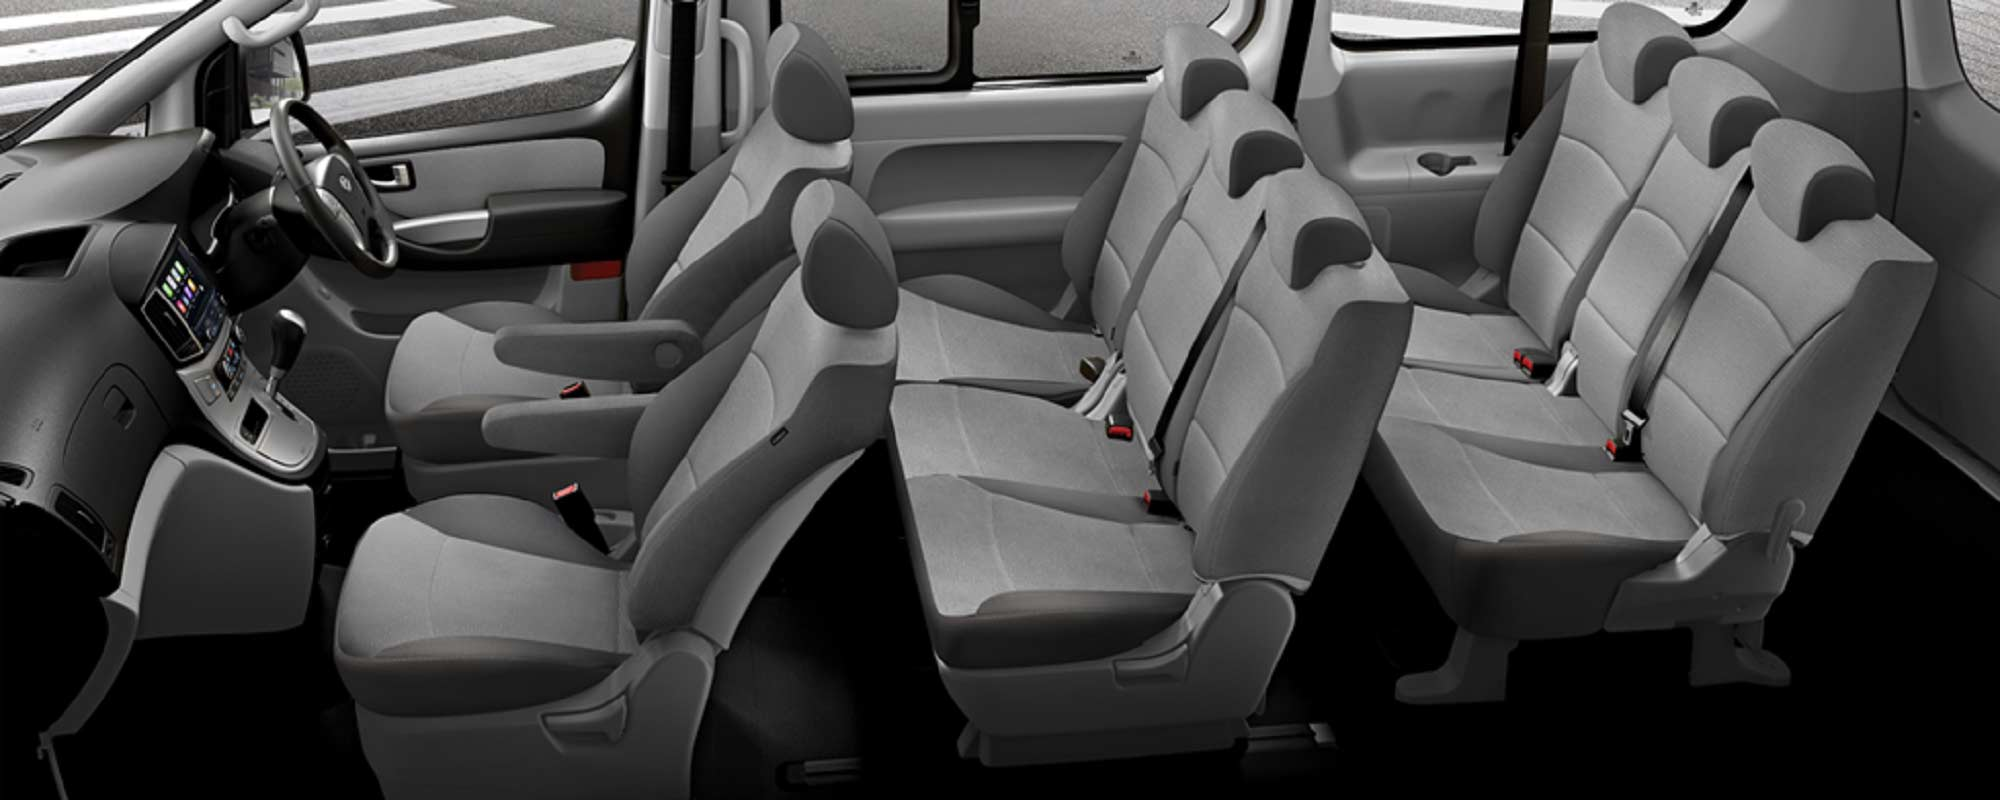 New Hyundai Imax For Sale In Albany Albany Hyundai